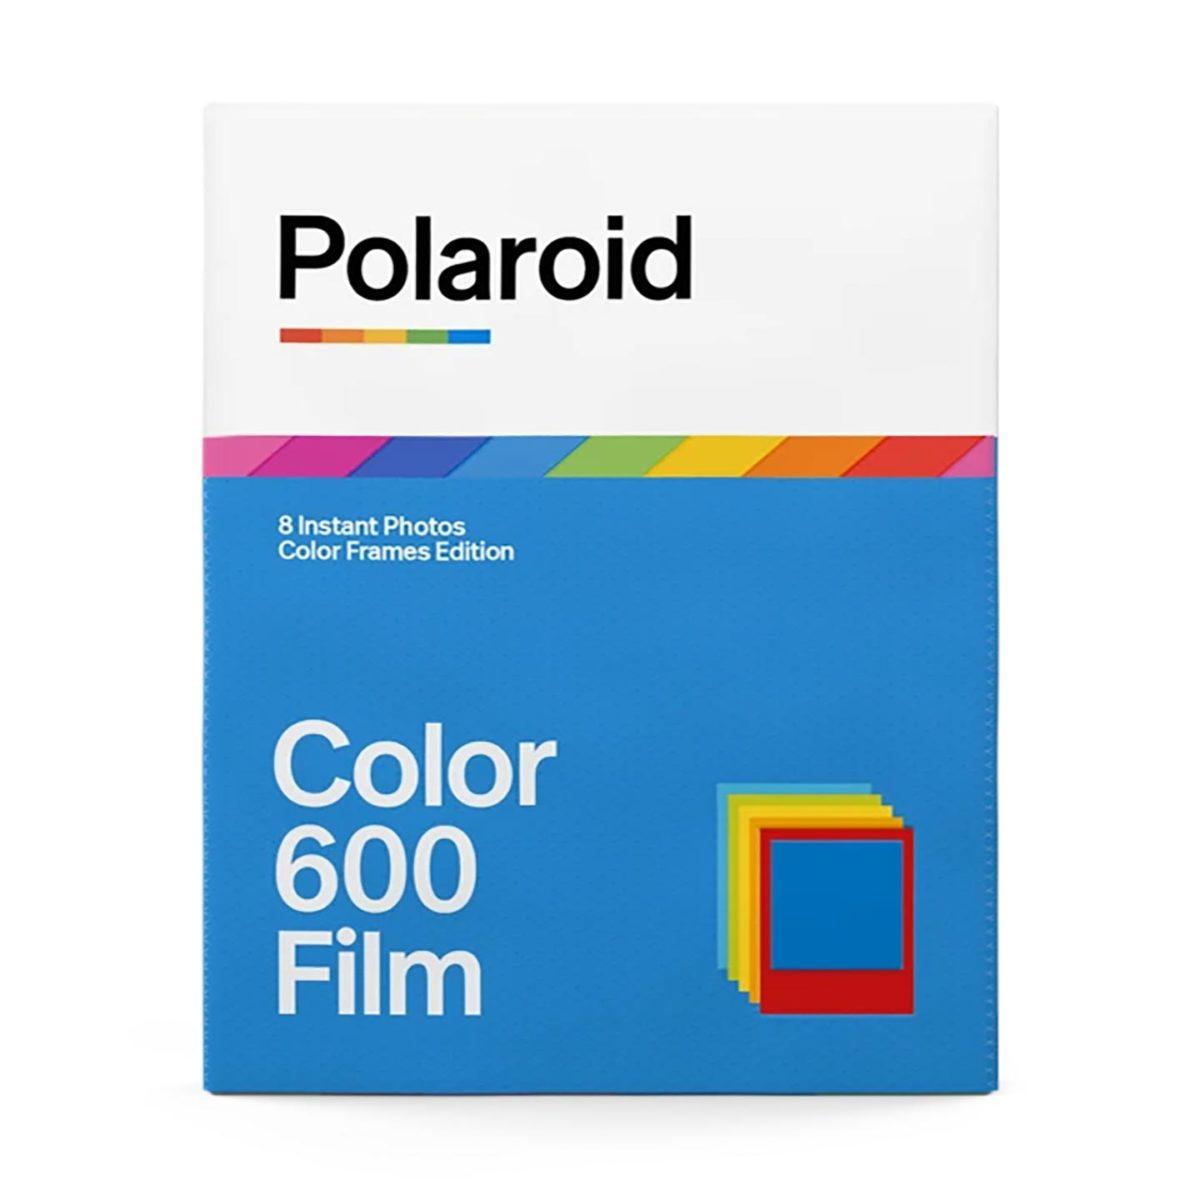 polaroid_600_color_film_color_frames_02